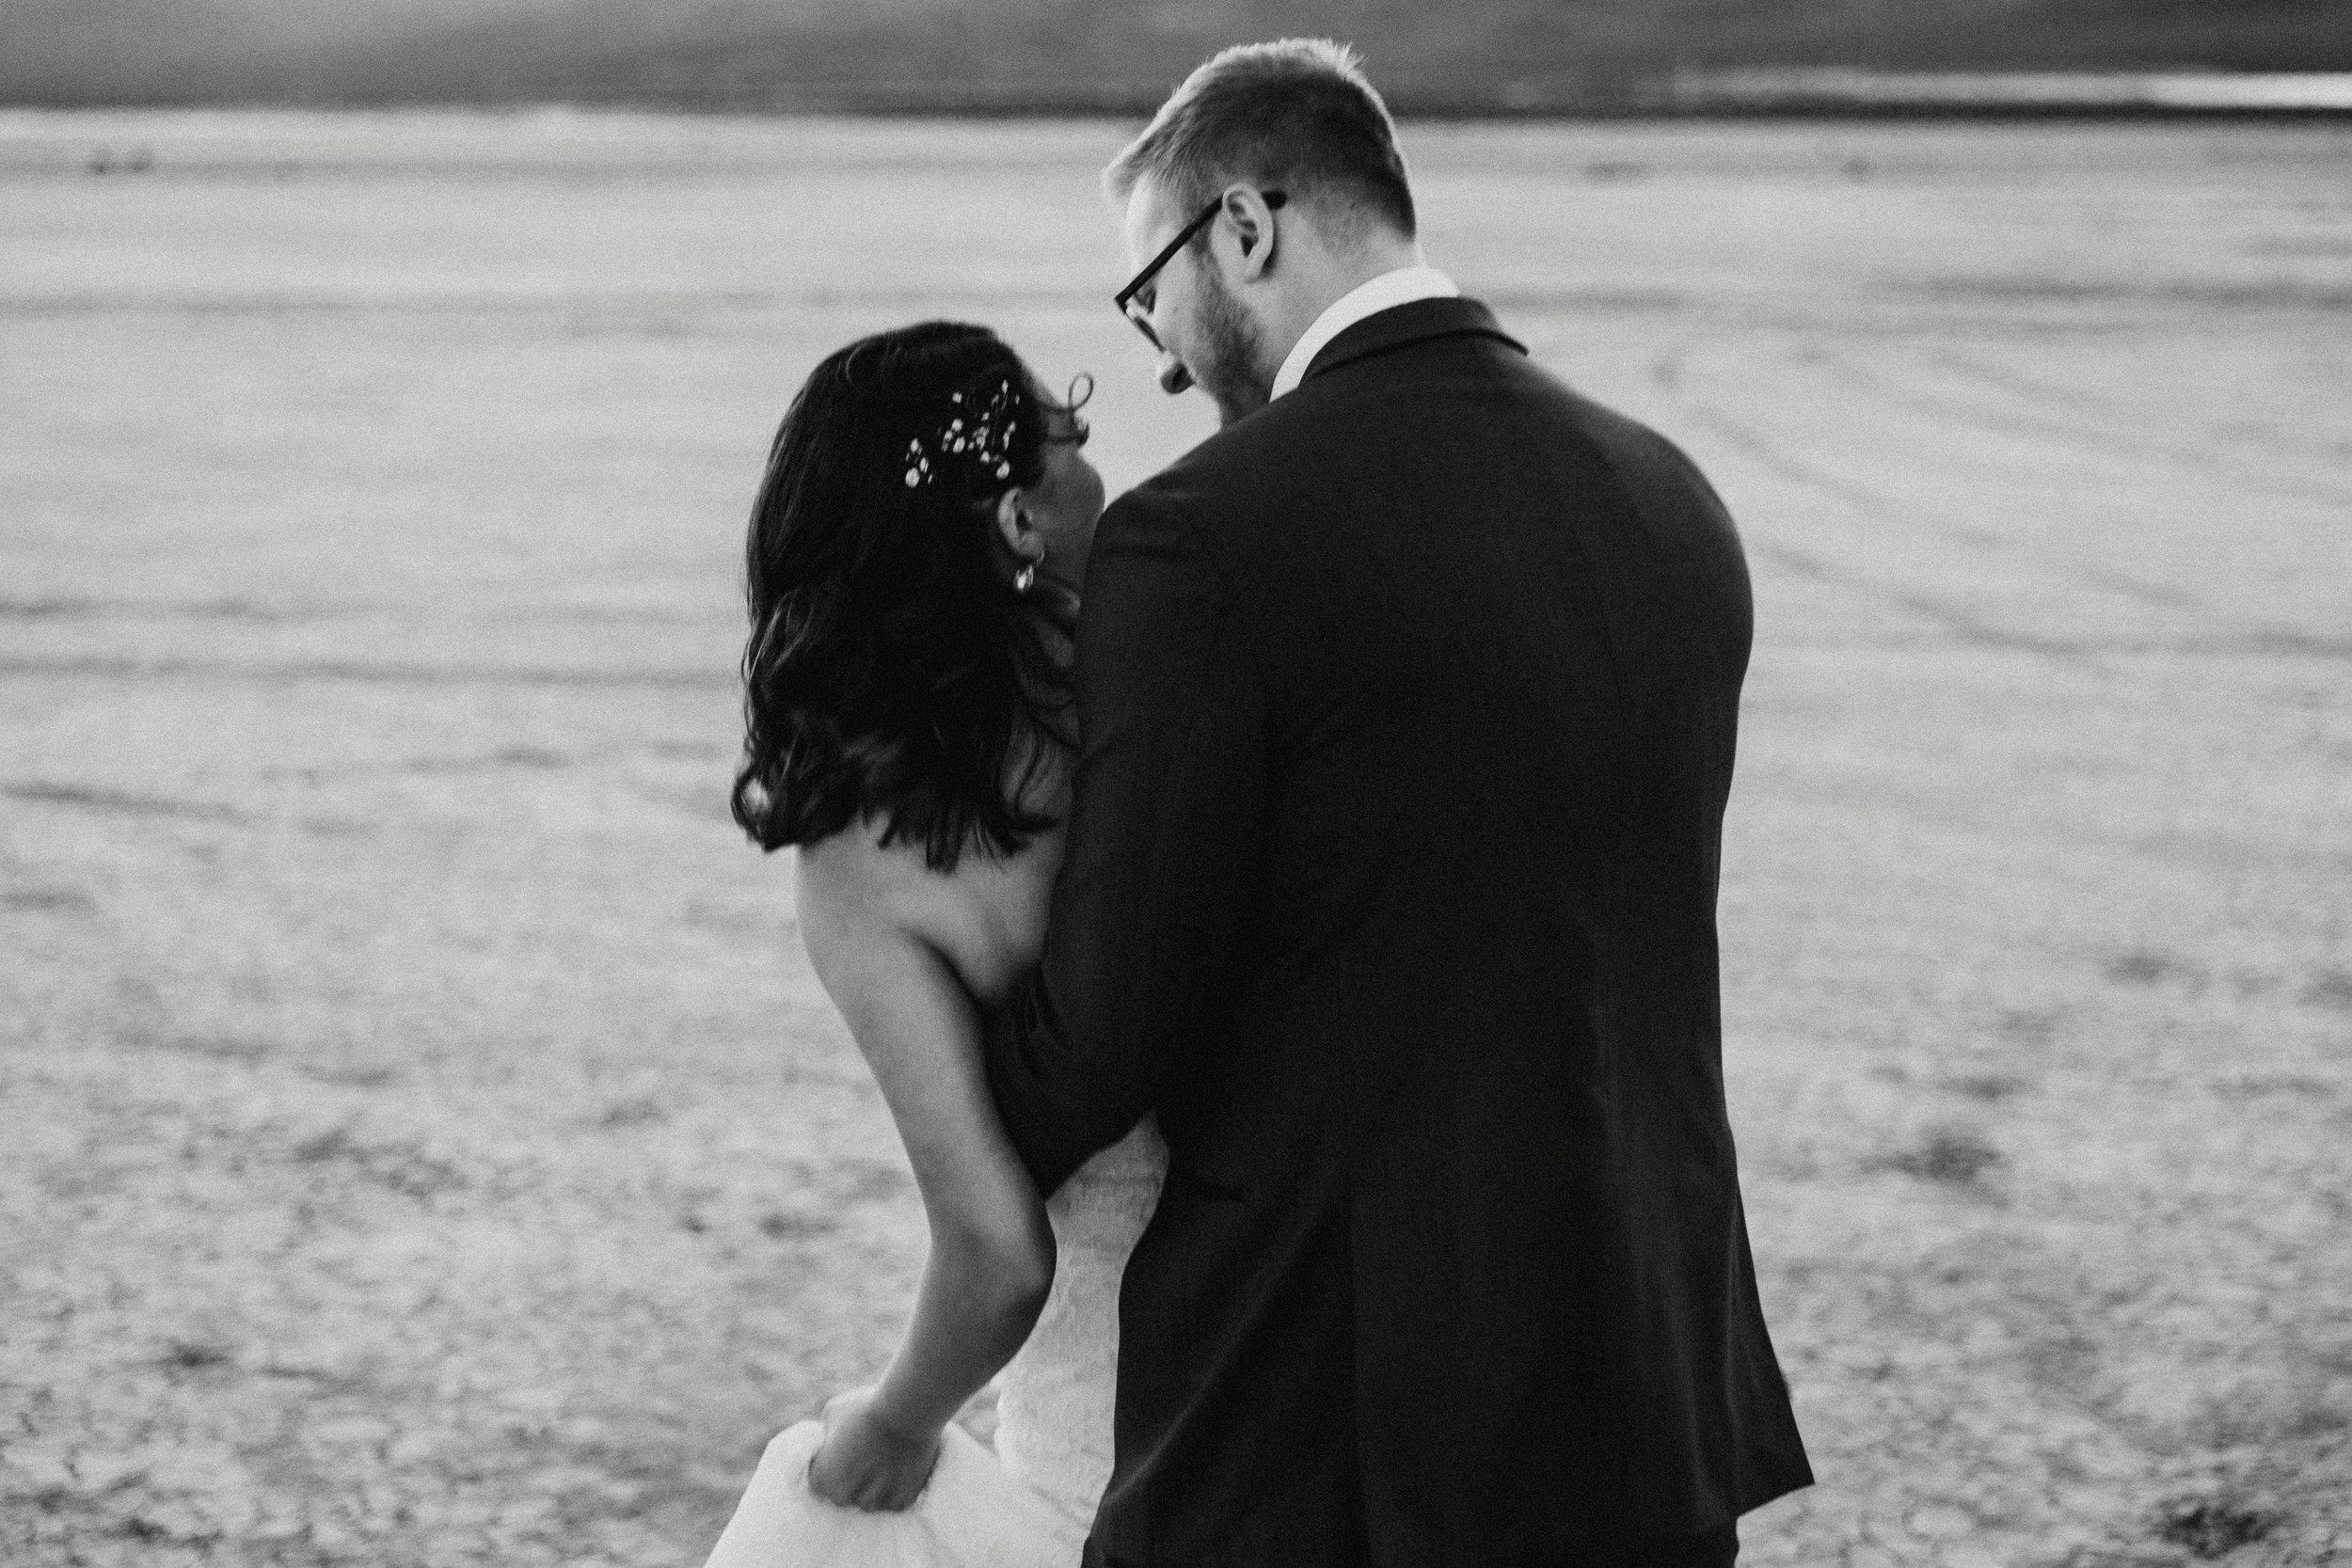 California Wedding Photographer - Las Vegas Wedding Photographer - Henderson, NV Wedding - Kamra Fuller Photography - Daniel + Jessica Wedding - Candid - Documentary Wedding Photographer - Lifestyle - Motion Blur - Slow Shutter Speed - Black and White Photography